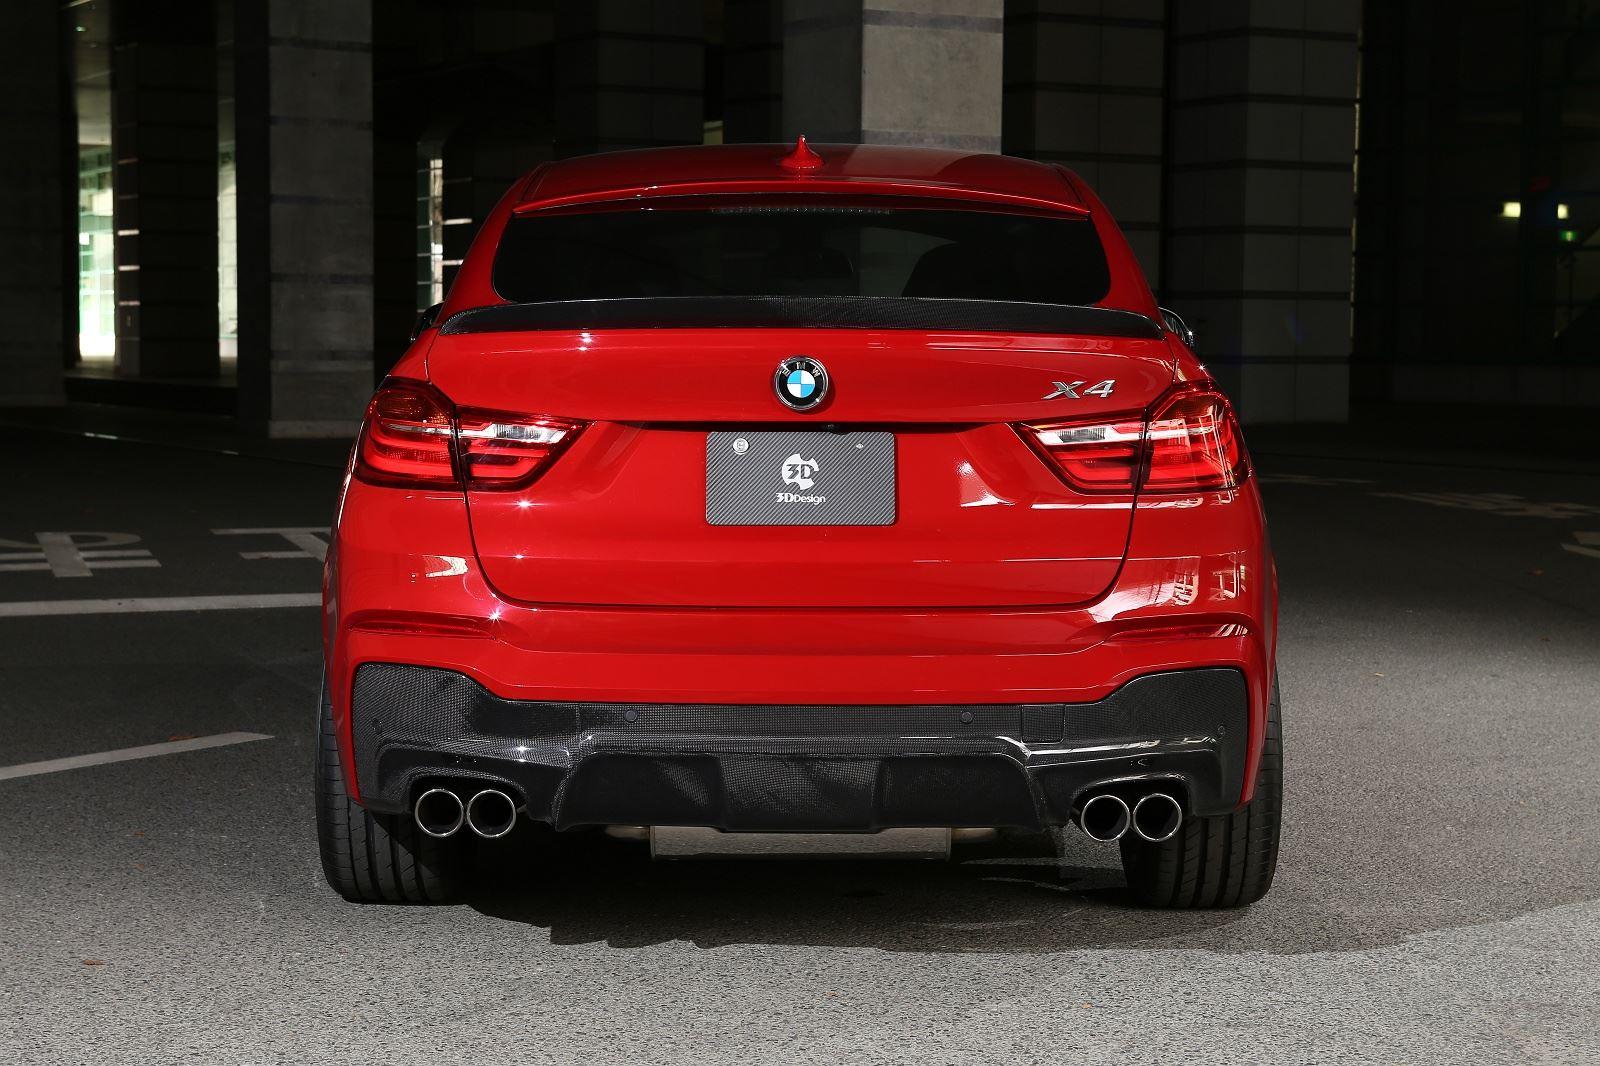 BMW X4 gets tuning program from 3D Design  BMW X4 Forum